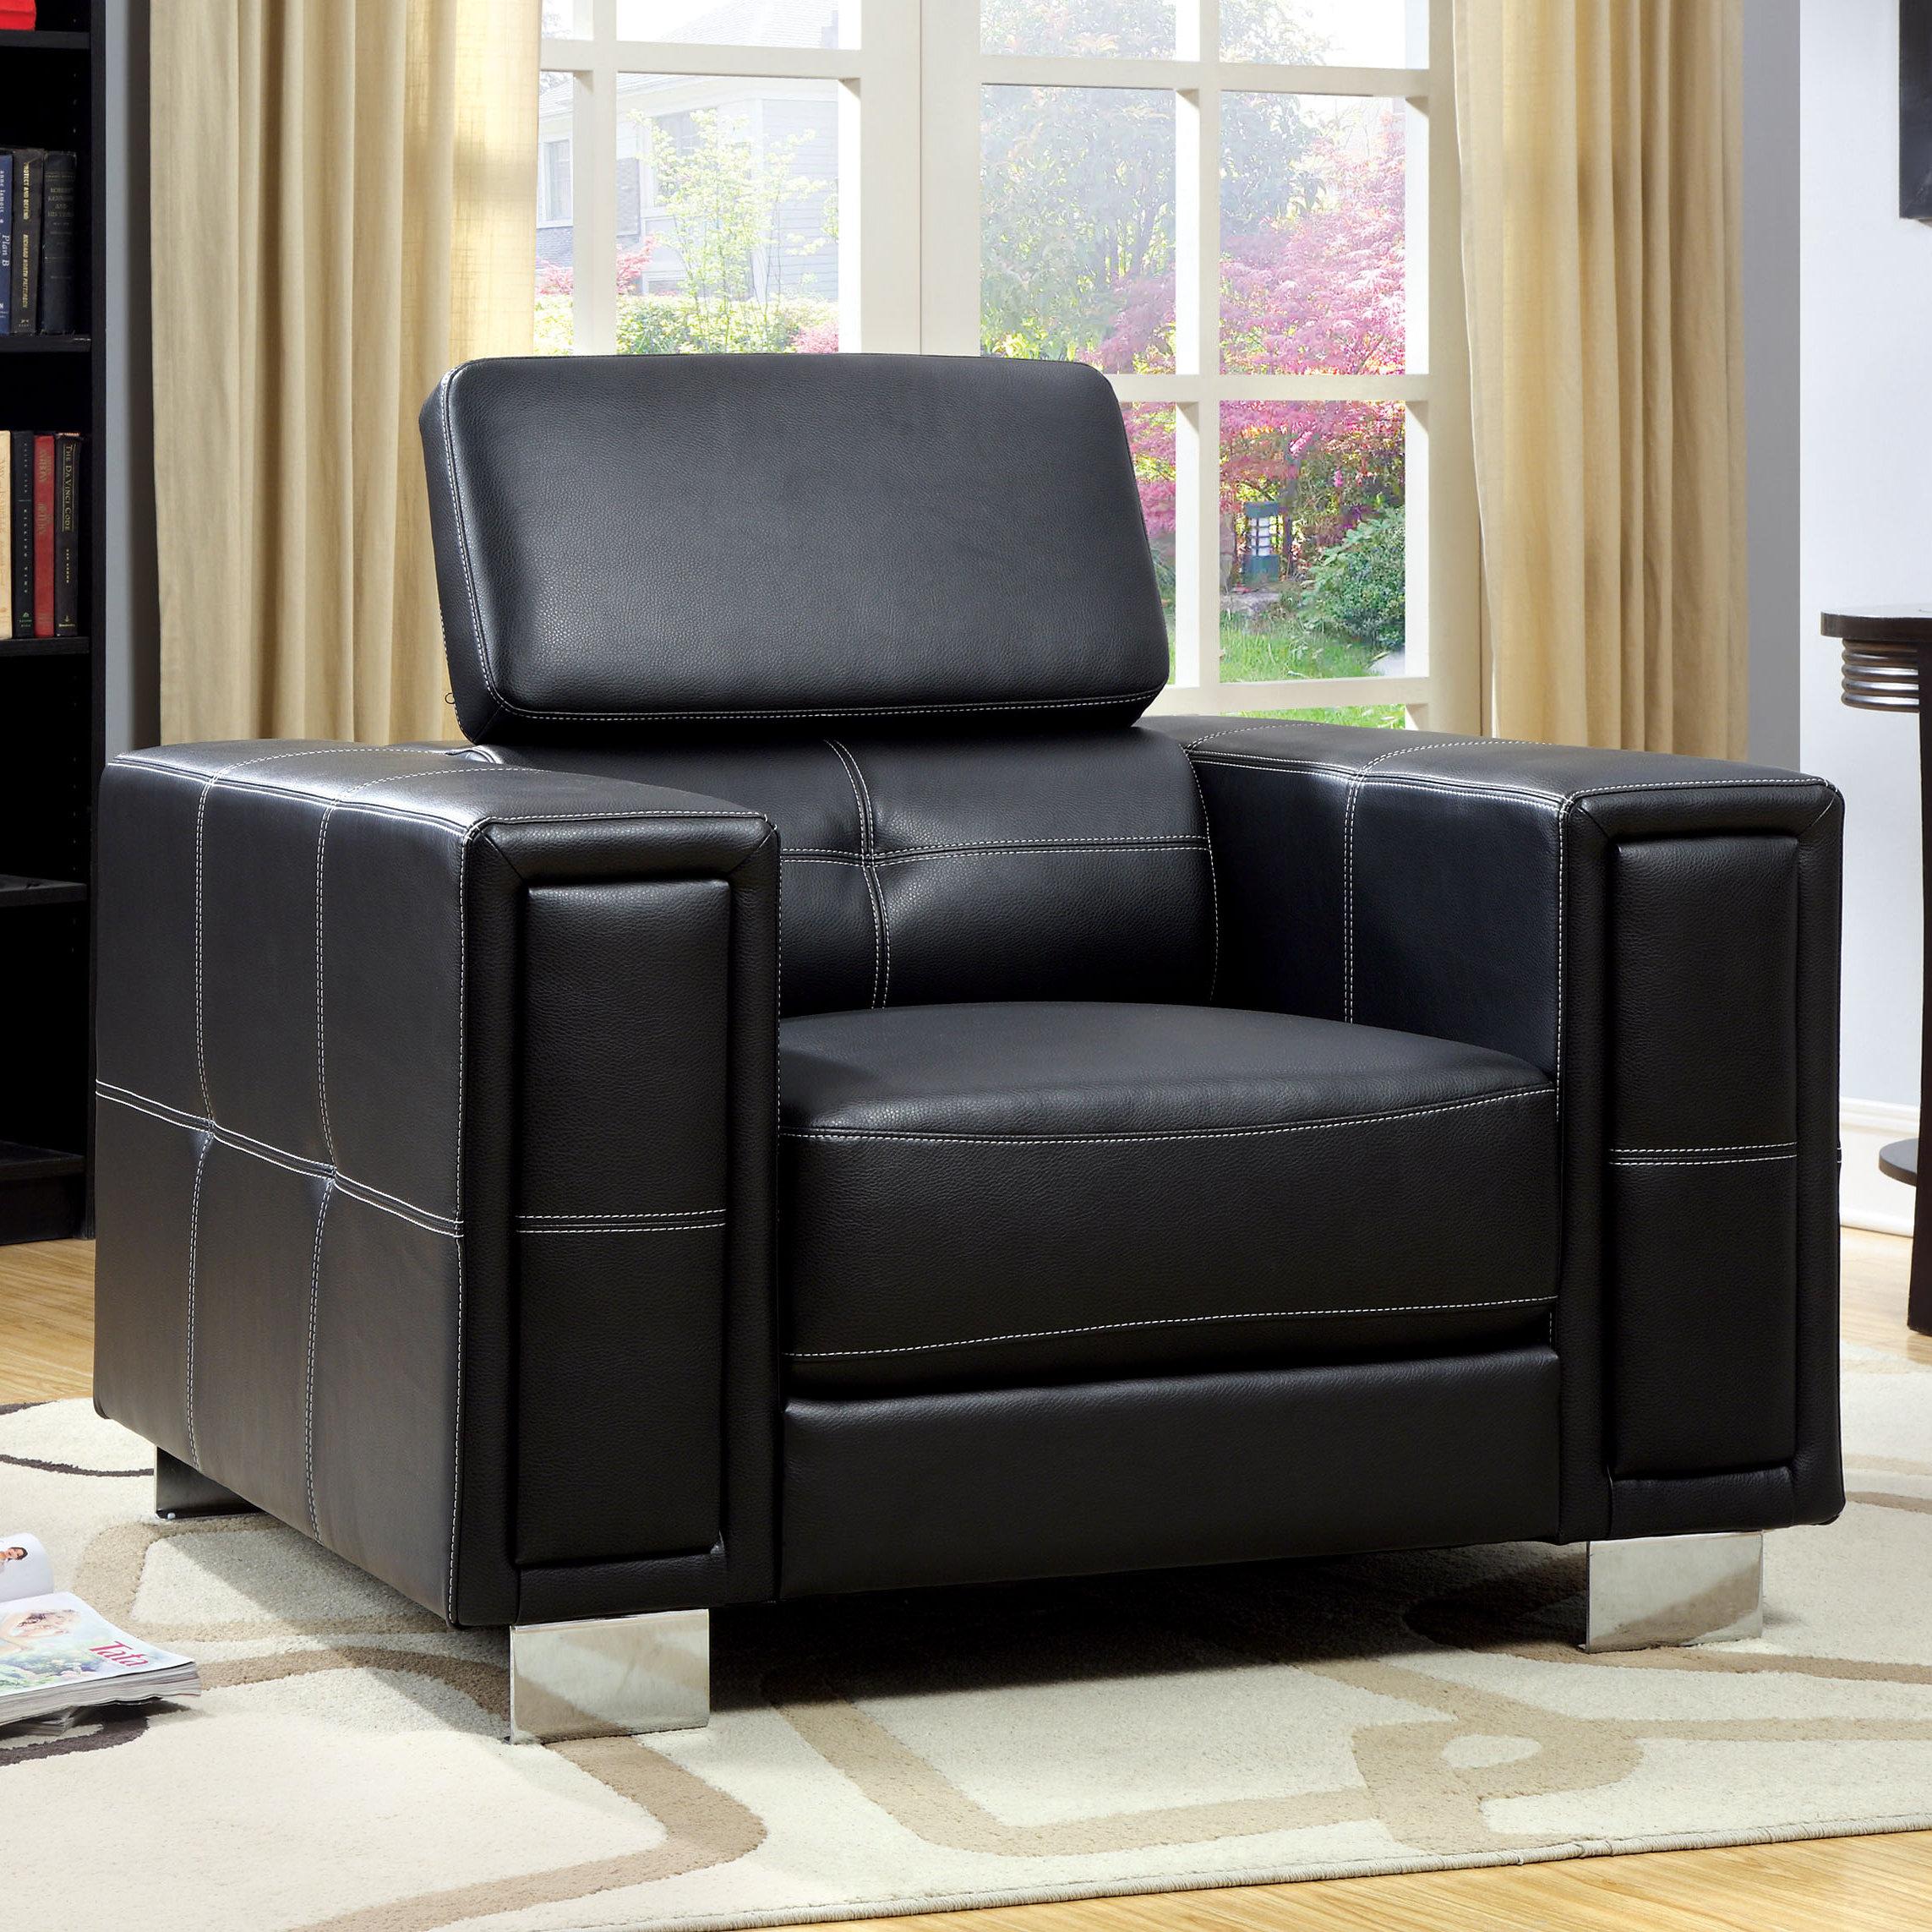 Swell Glenwill Club Chair Machost Co Dining Chair Design Ideas Machostcouk